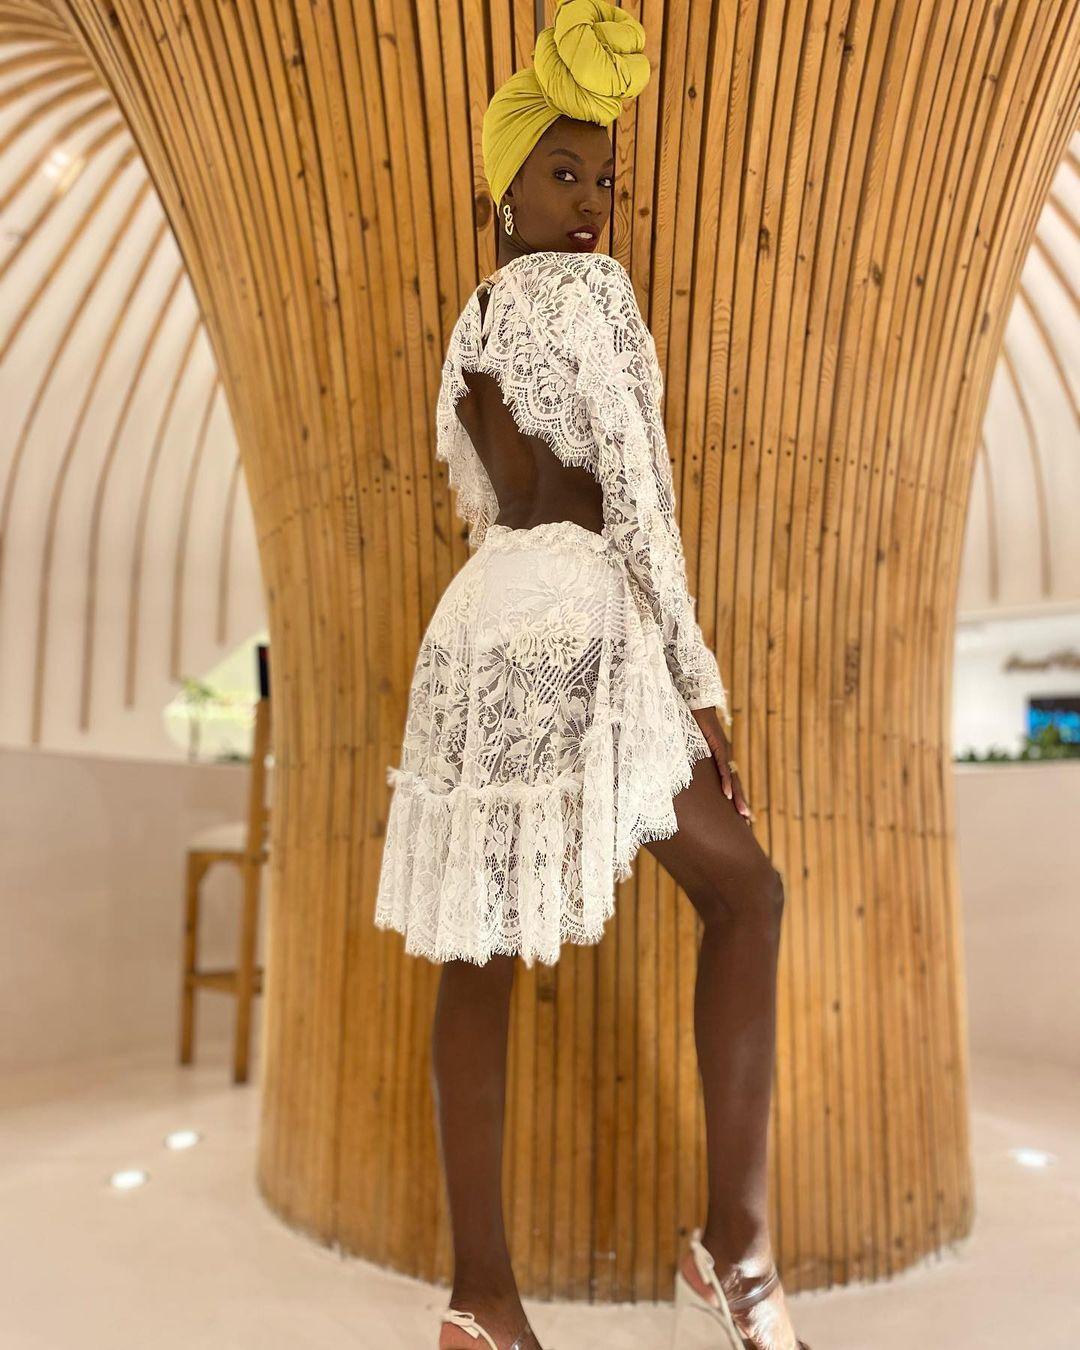 karina azevedo, top 15 de top model of the world 2021. - Página 2 Yghcp10